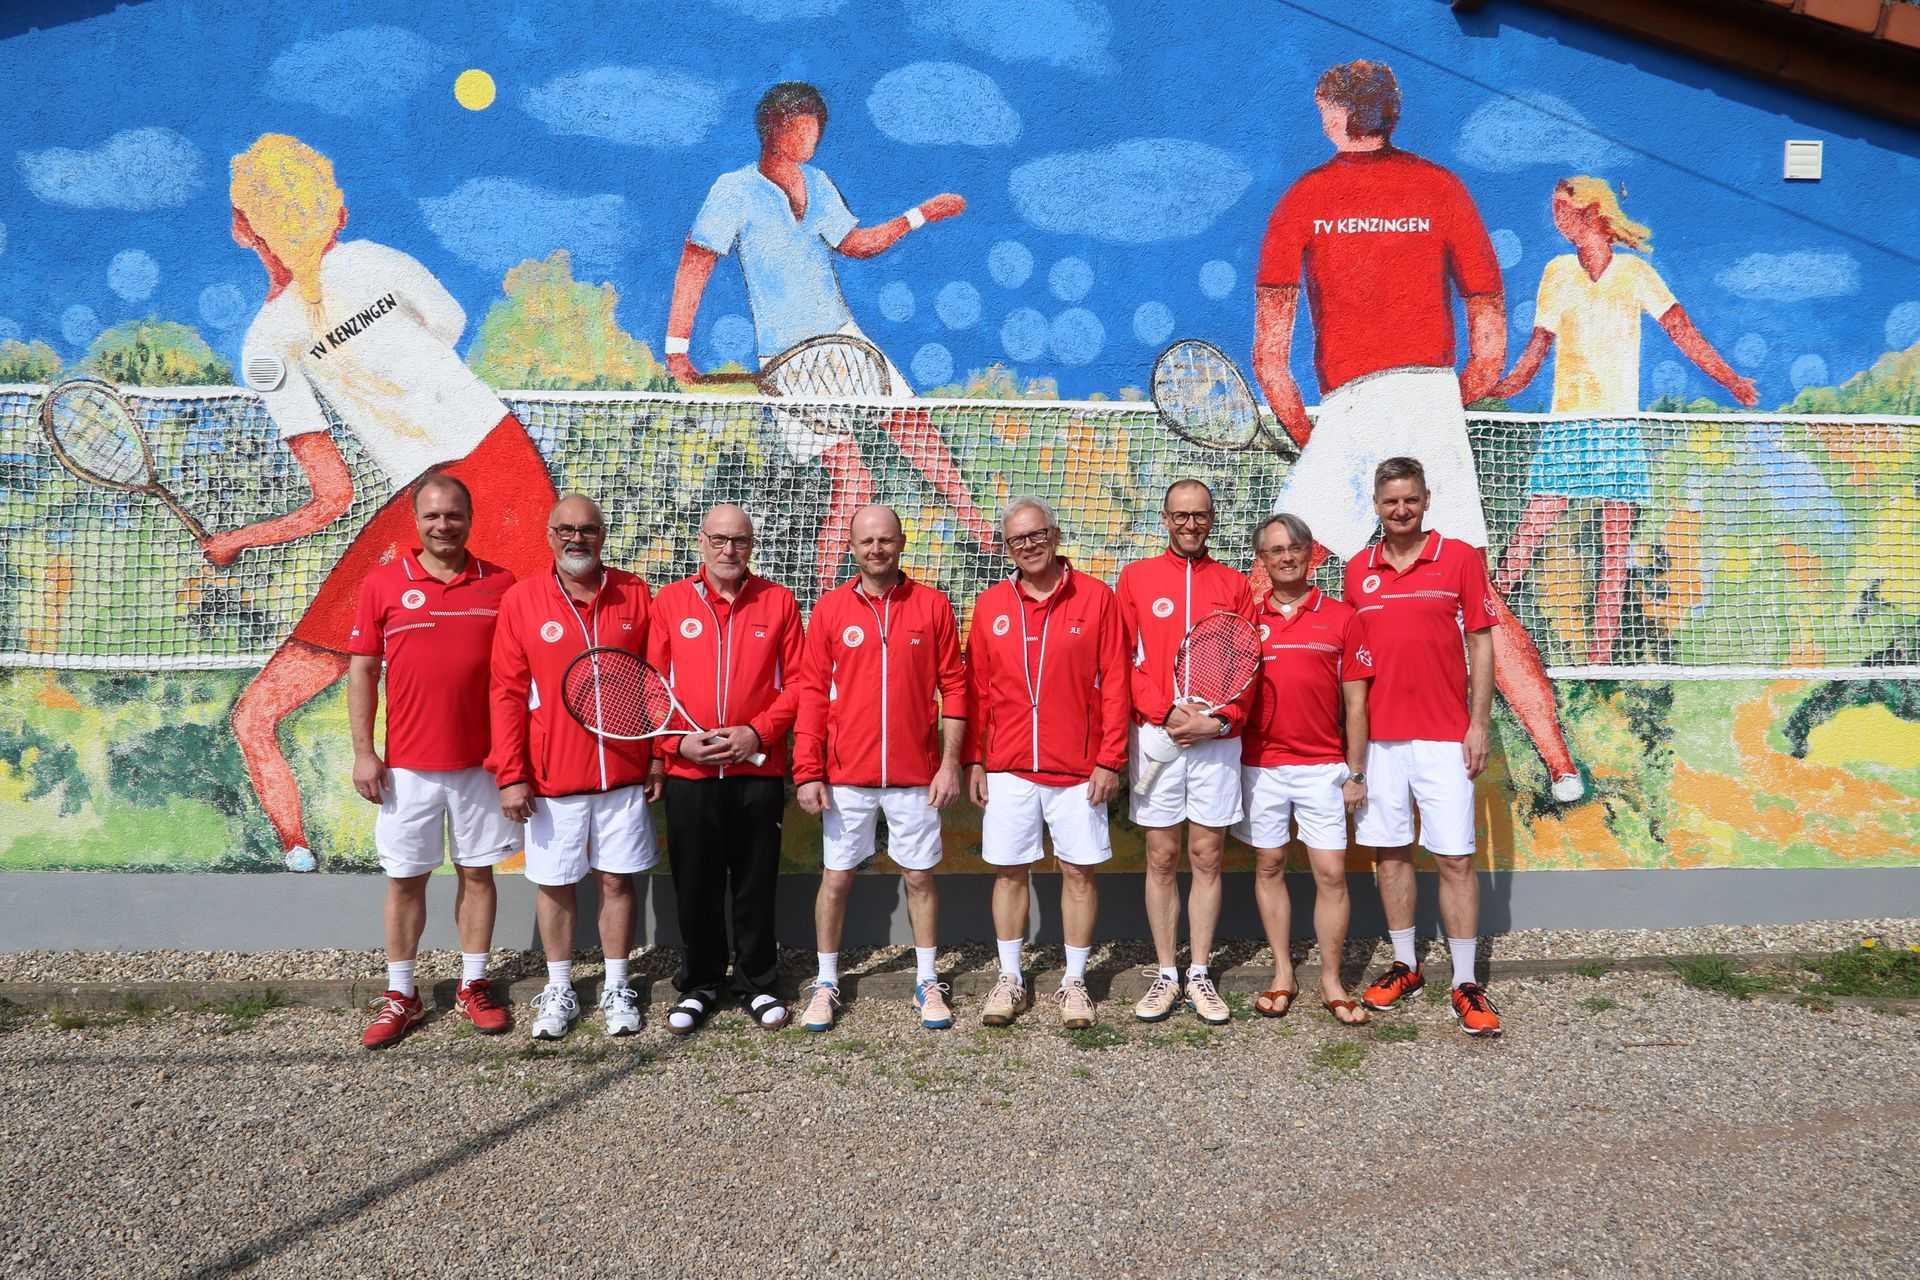 Tennisverein Kenzingen manschafte 18